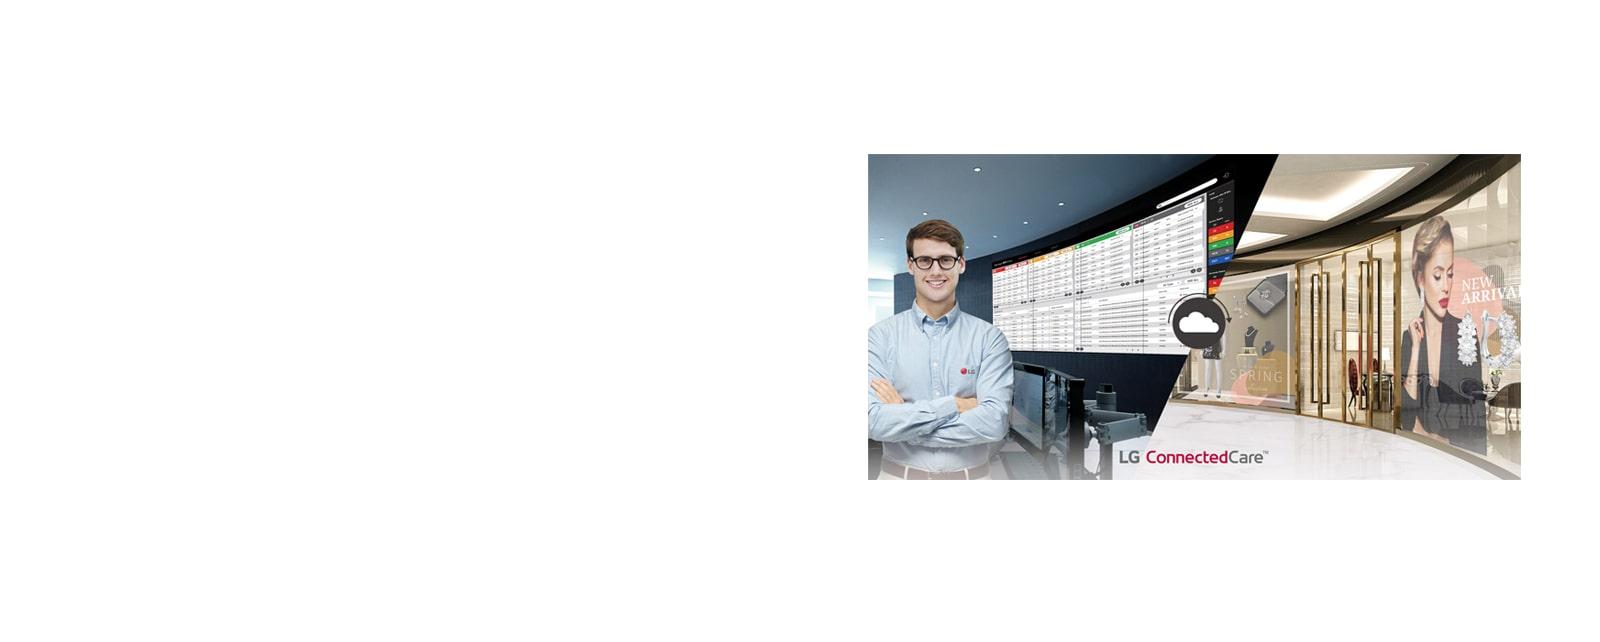 43UL3G-B Display Monitor LG Connectedcare